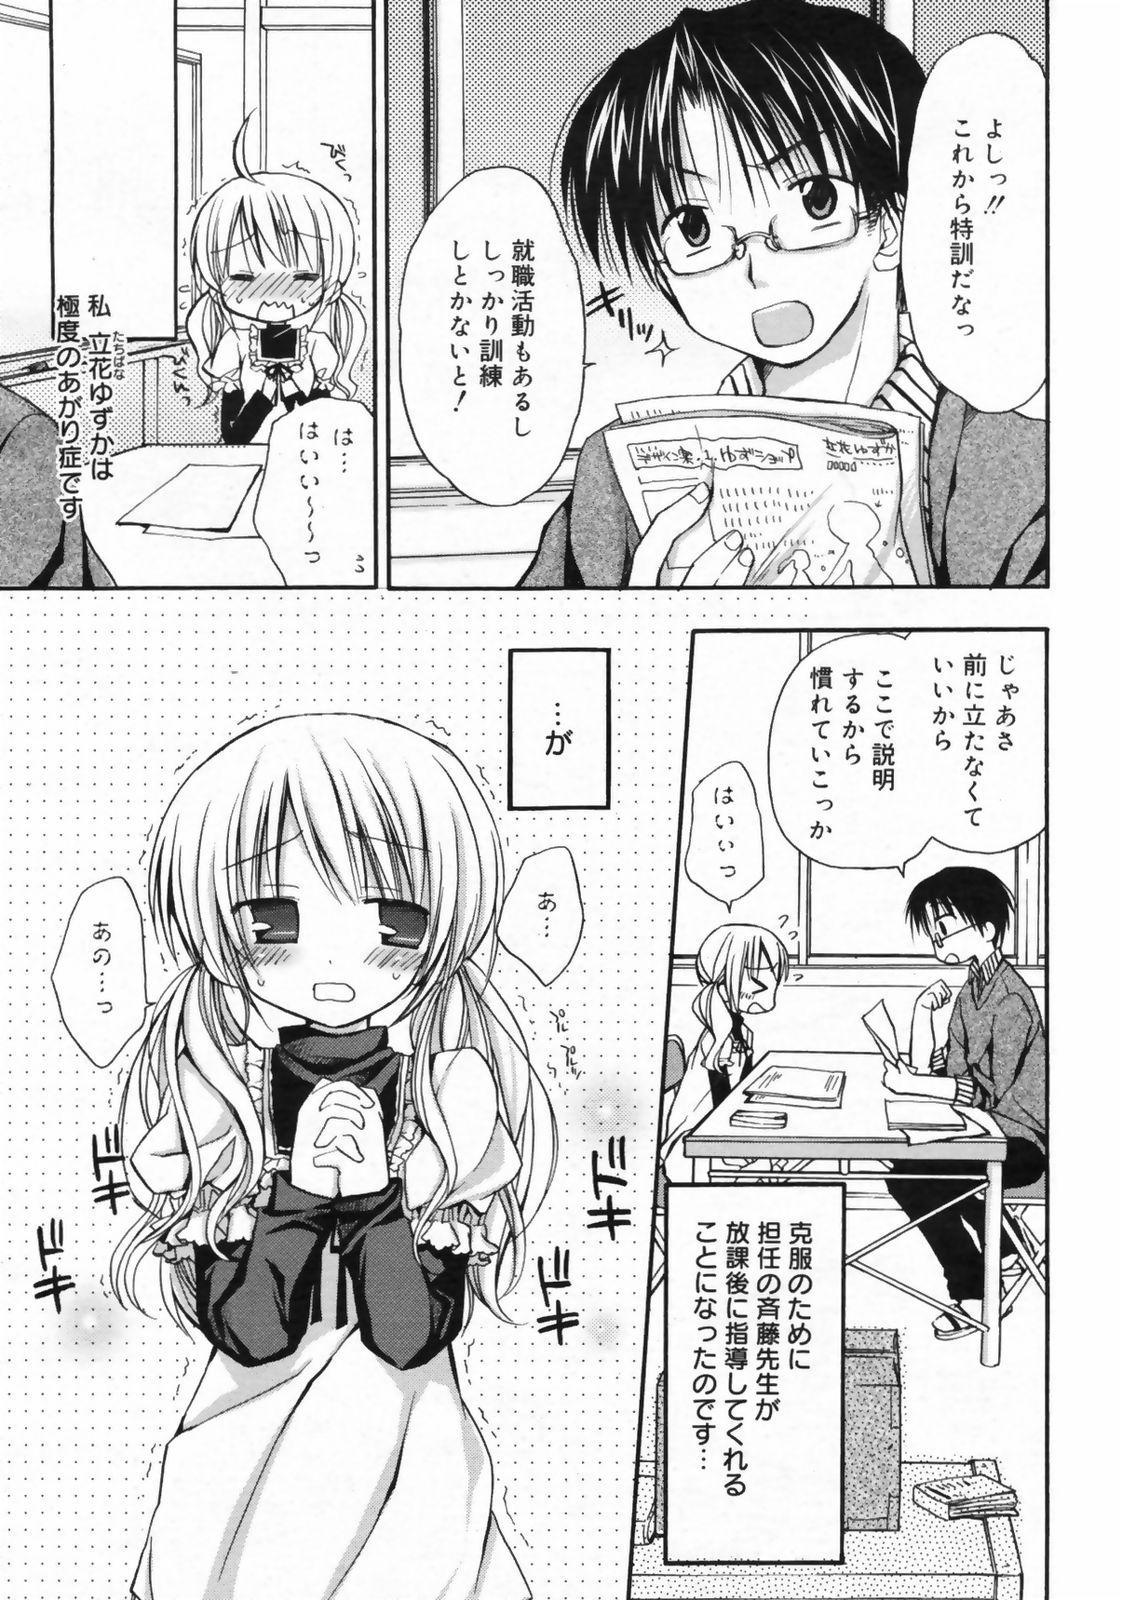 Manga Bangaichi 2009-02 Vol. 234 22